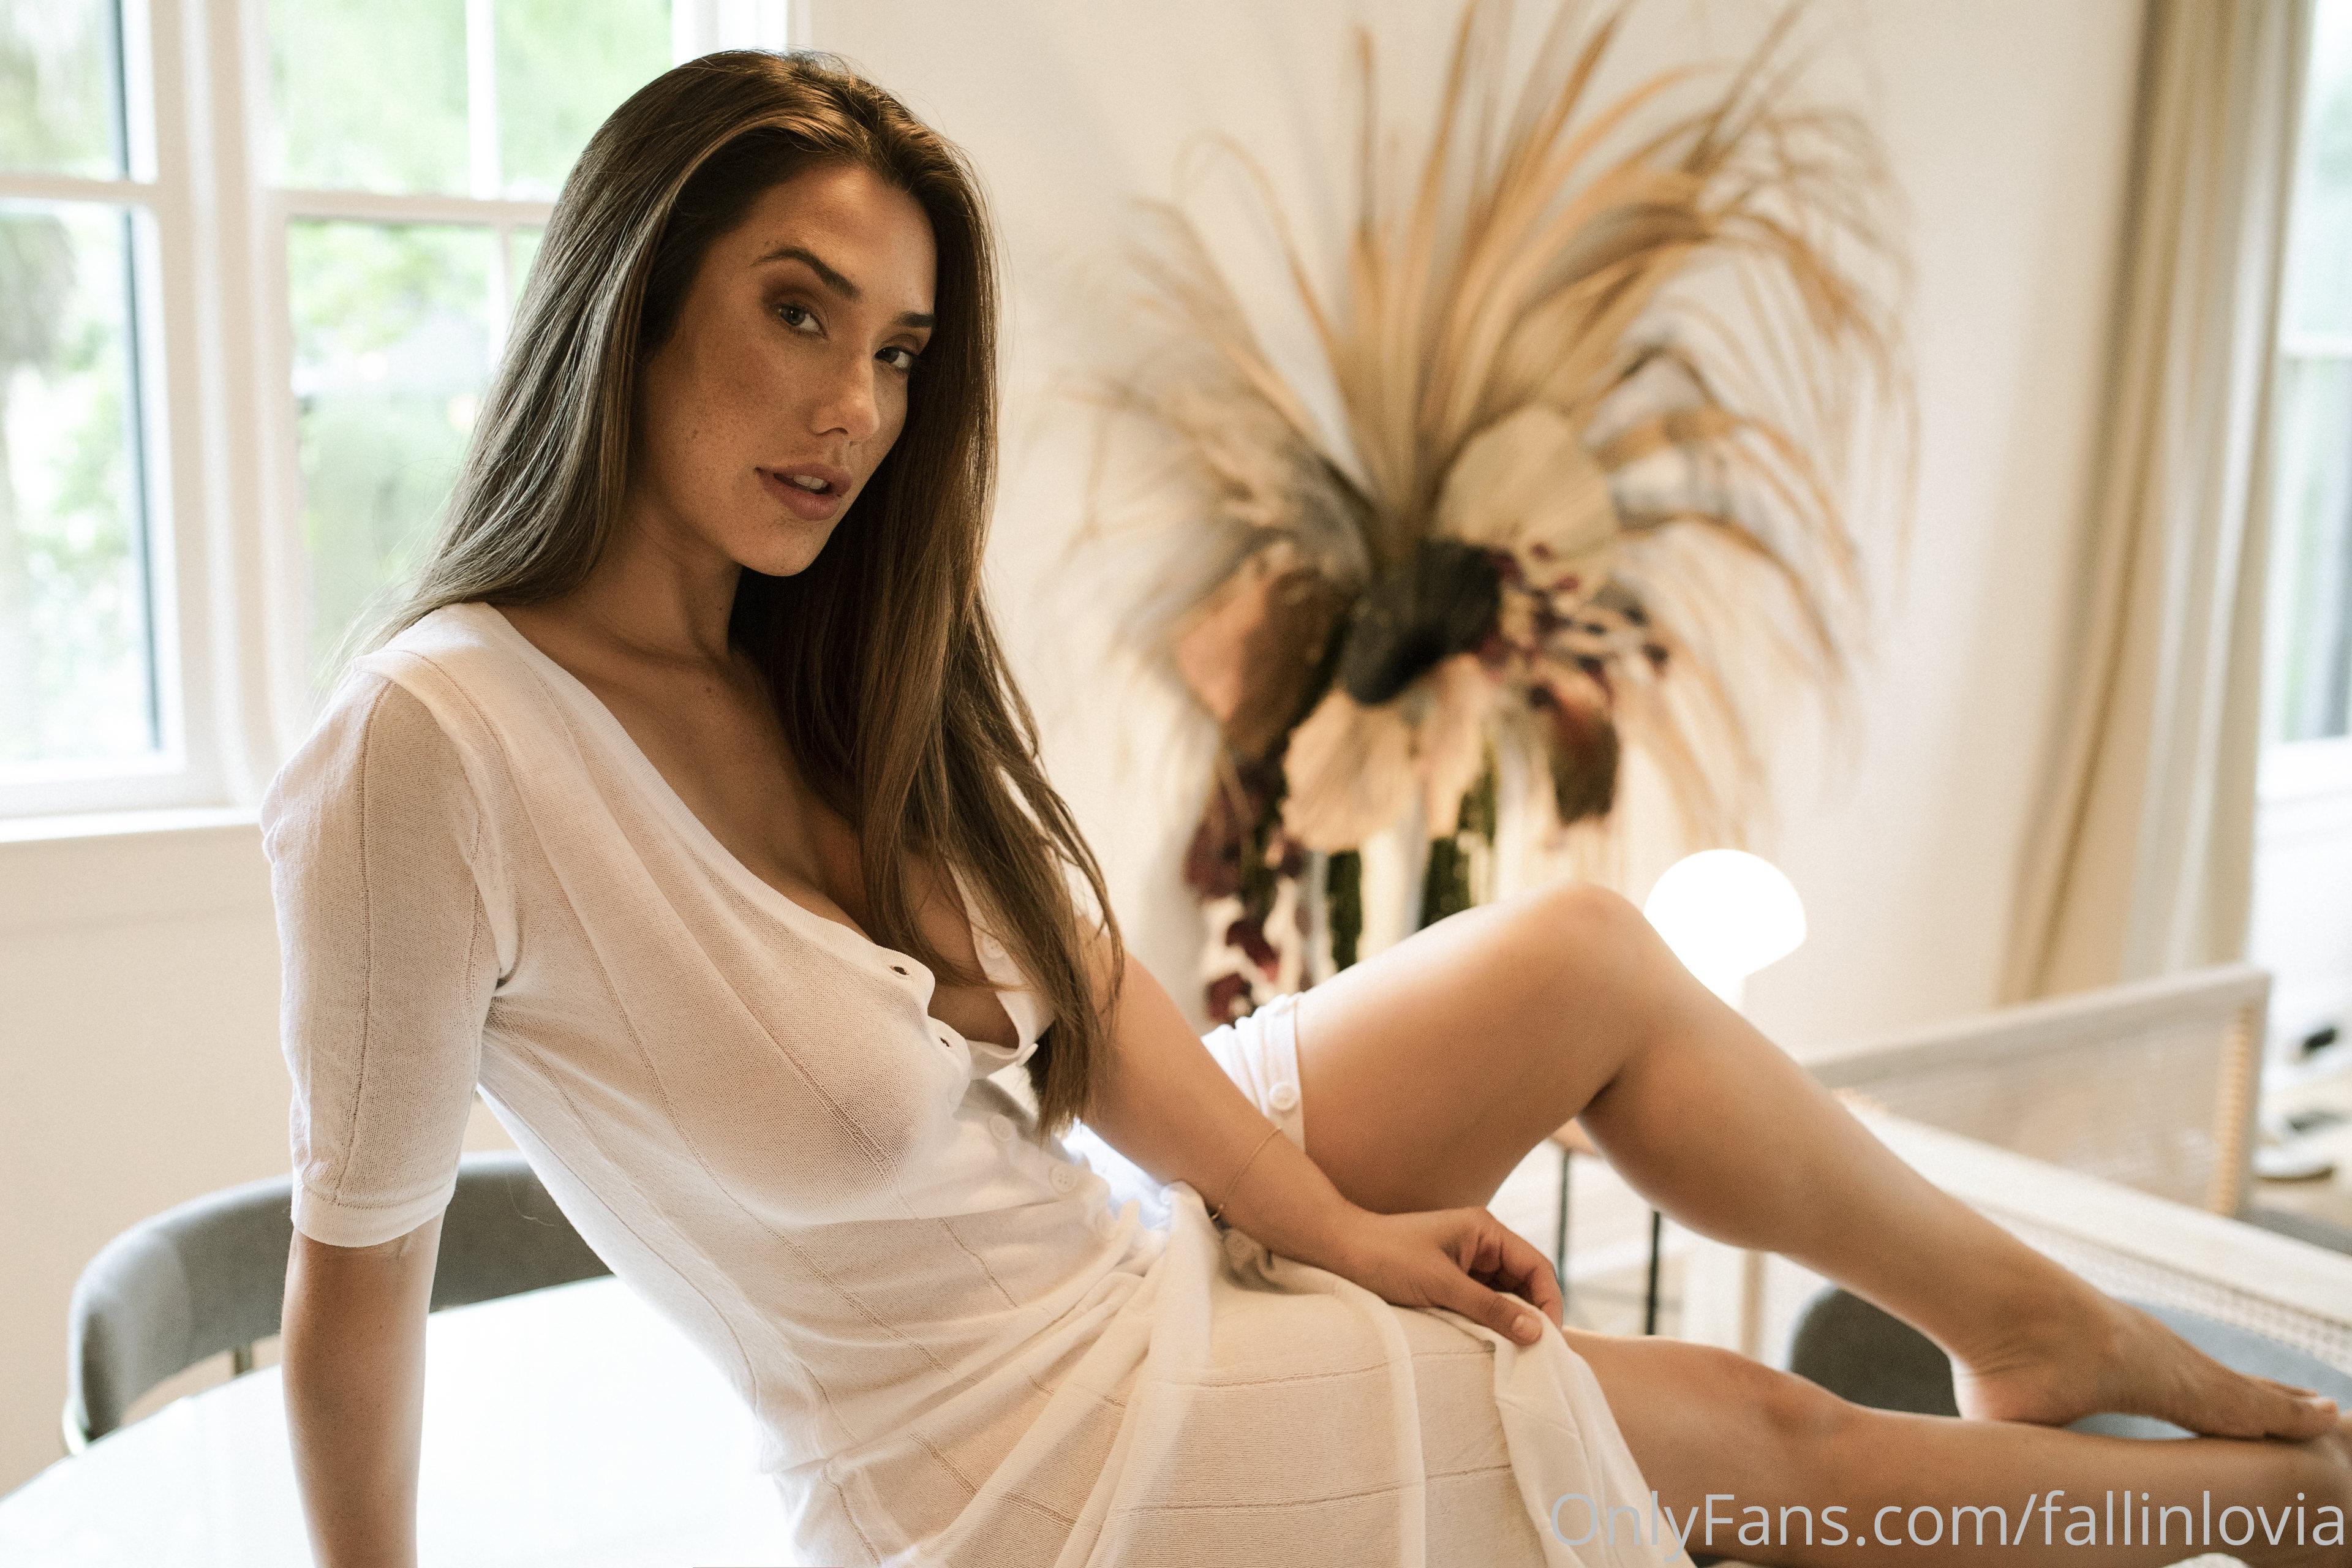 Eva Lovia, Fallinlovia, Onlyfans 0098